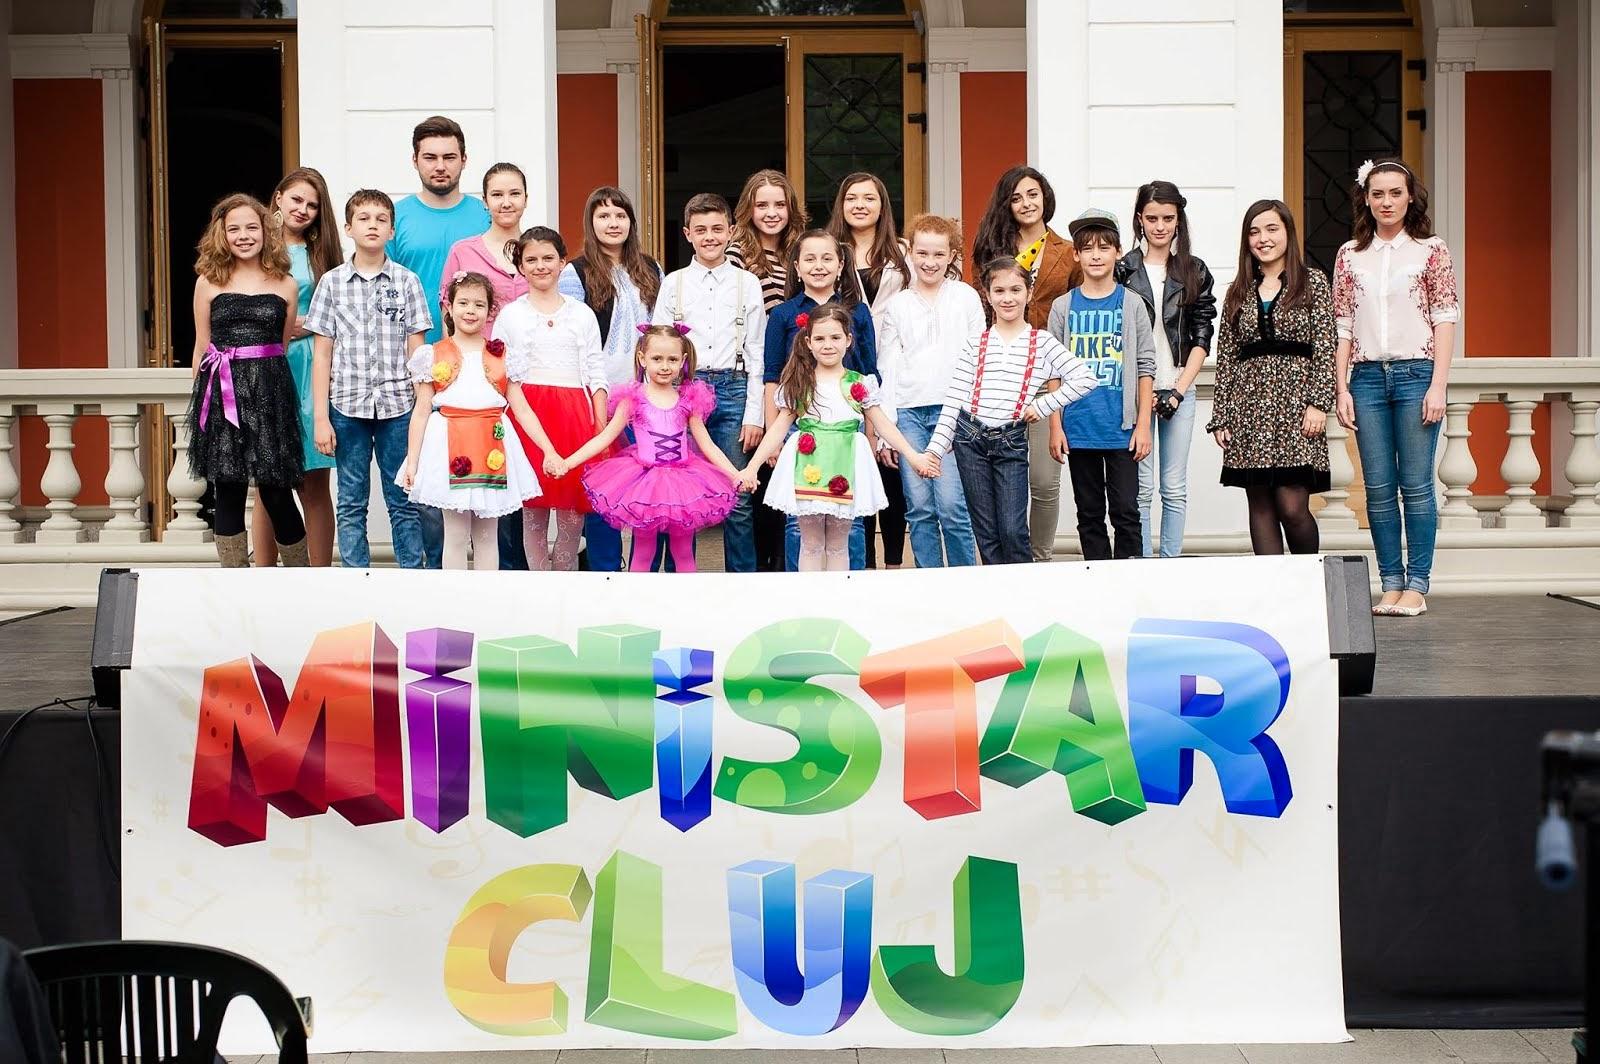 Ministar Cluj-Muzica usoara si populara pentru copii